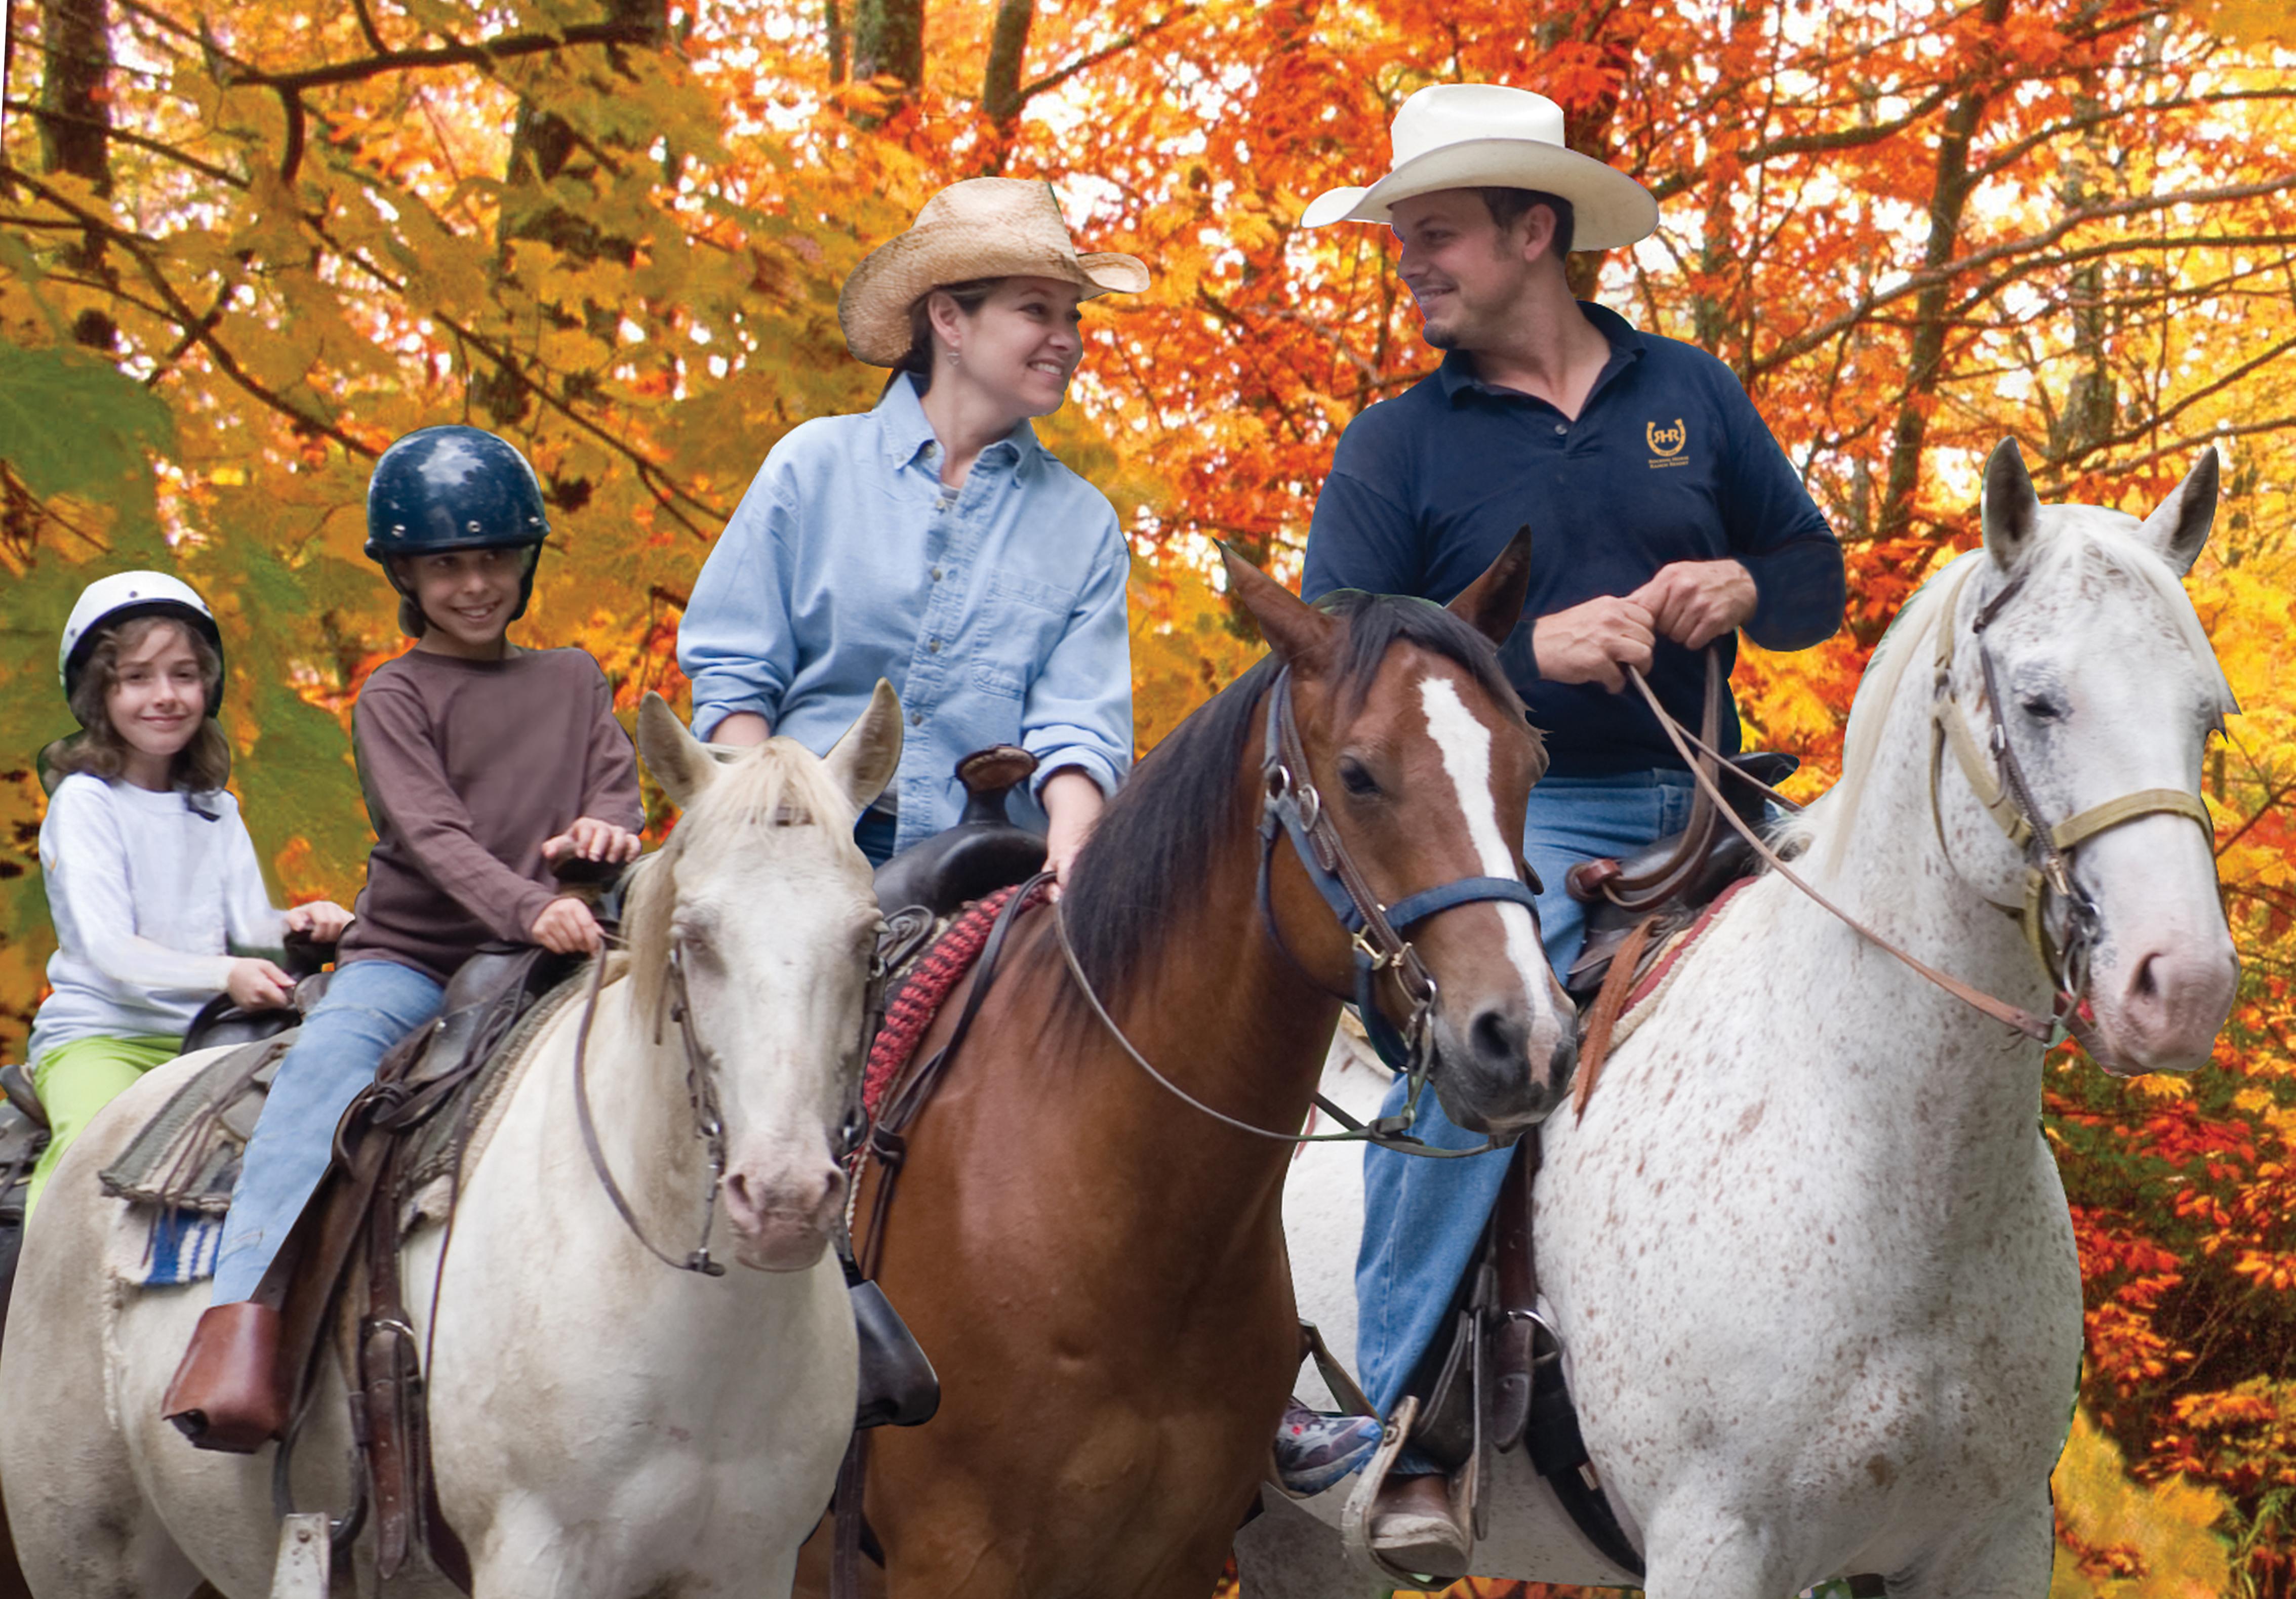 Catskills Ranch For Saddling Up And Having Fun The Boston Globe